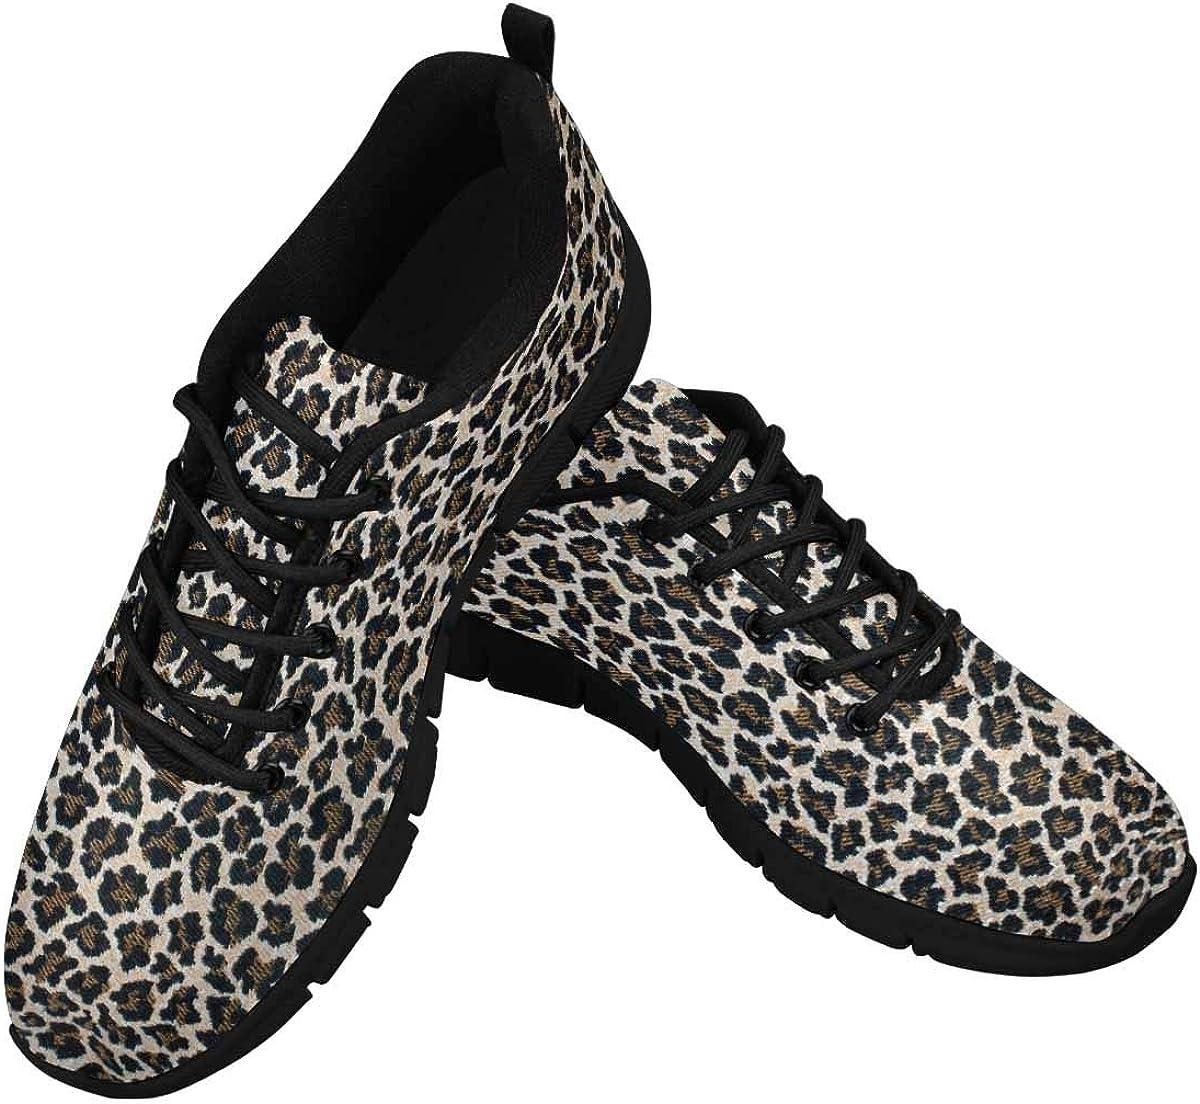 INTERESTPRINT Leopard Background Lightweight Mesh Breathable Sneakers for Women